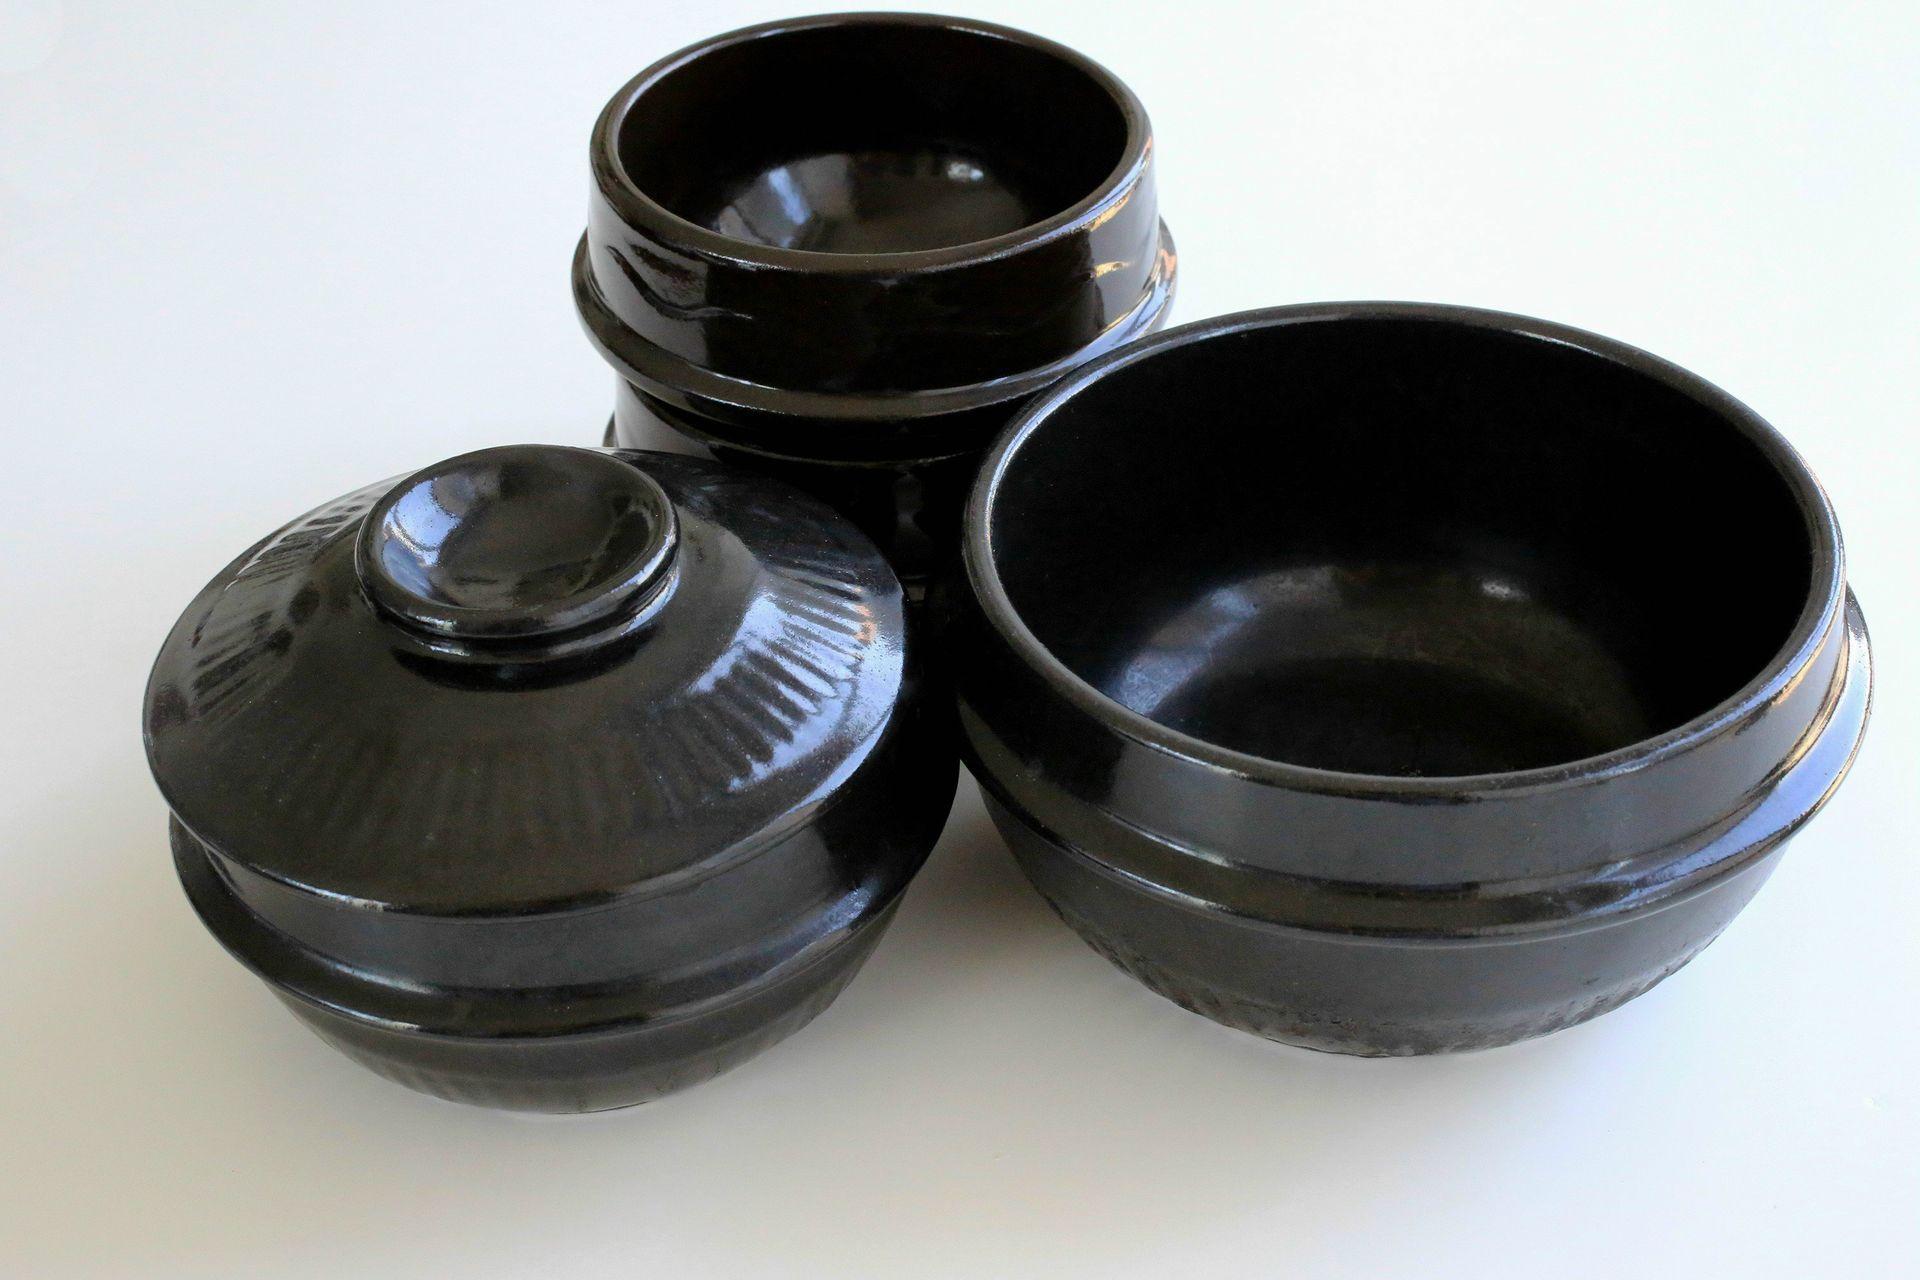 earthenware-pots-cooking